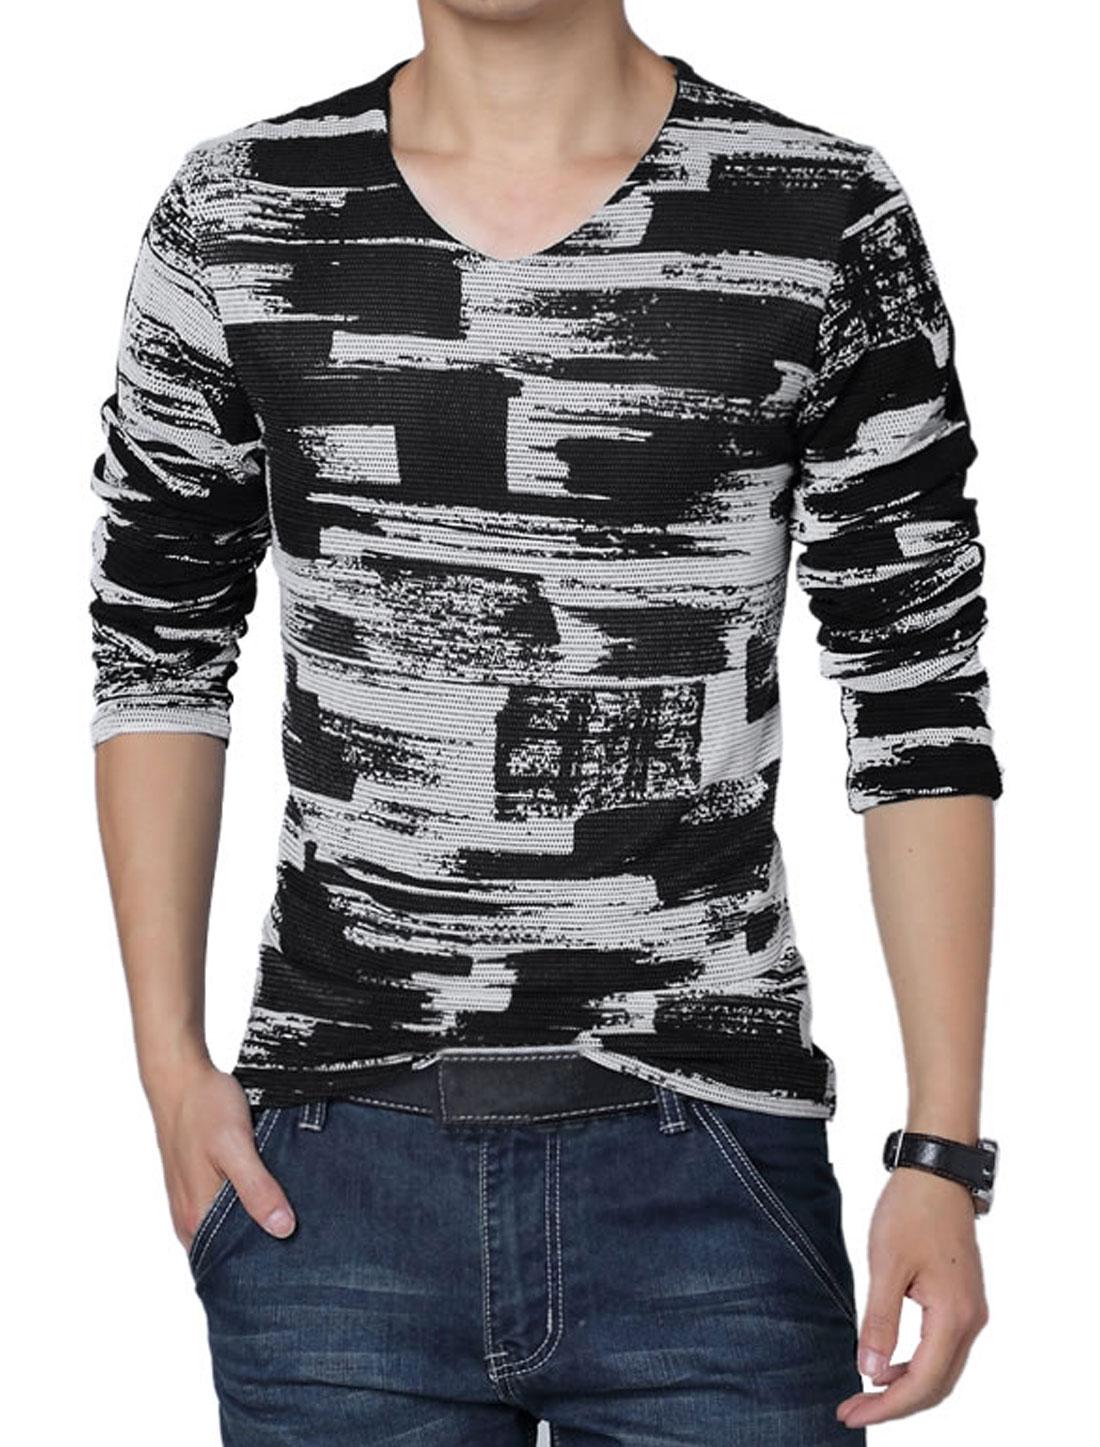 Men V Neck Novelty Prints Panel Lining T-Shirt White Black M